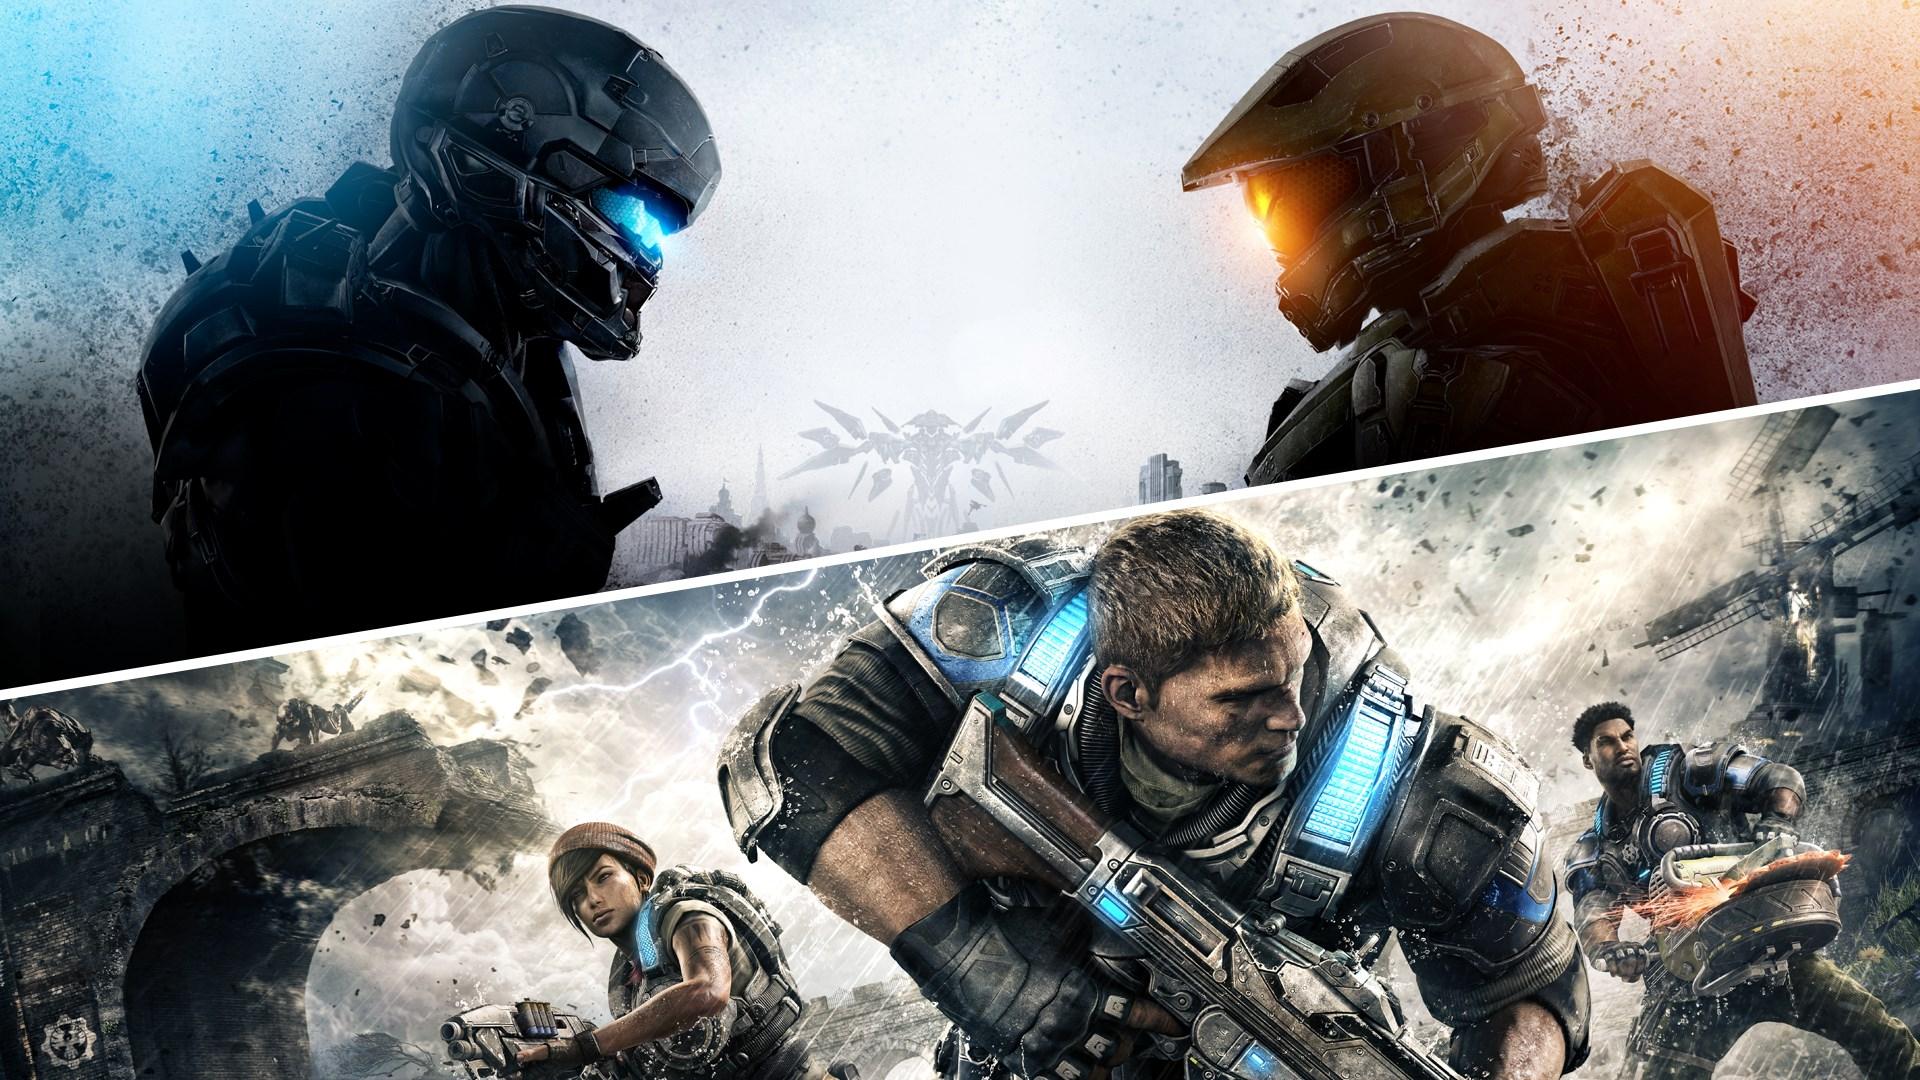 Lot GearsofWar4 et Halo 5:Guardians